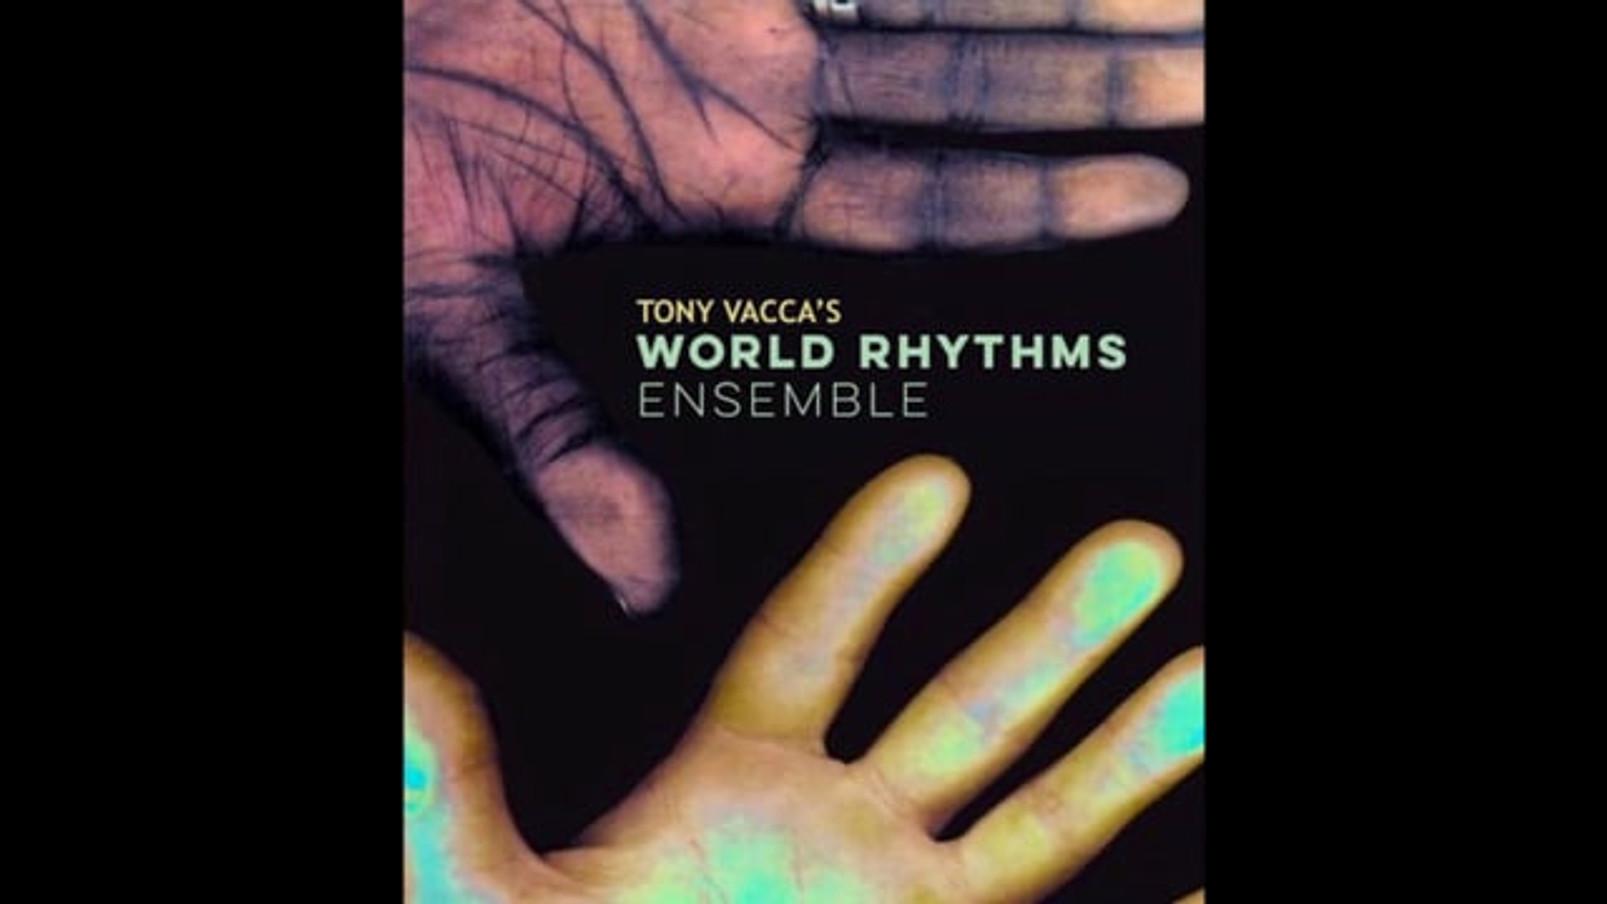 Tony Vacca's World Rhythms Ensemble